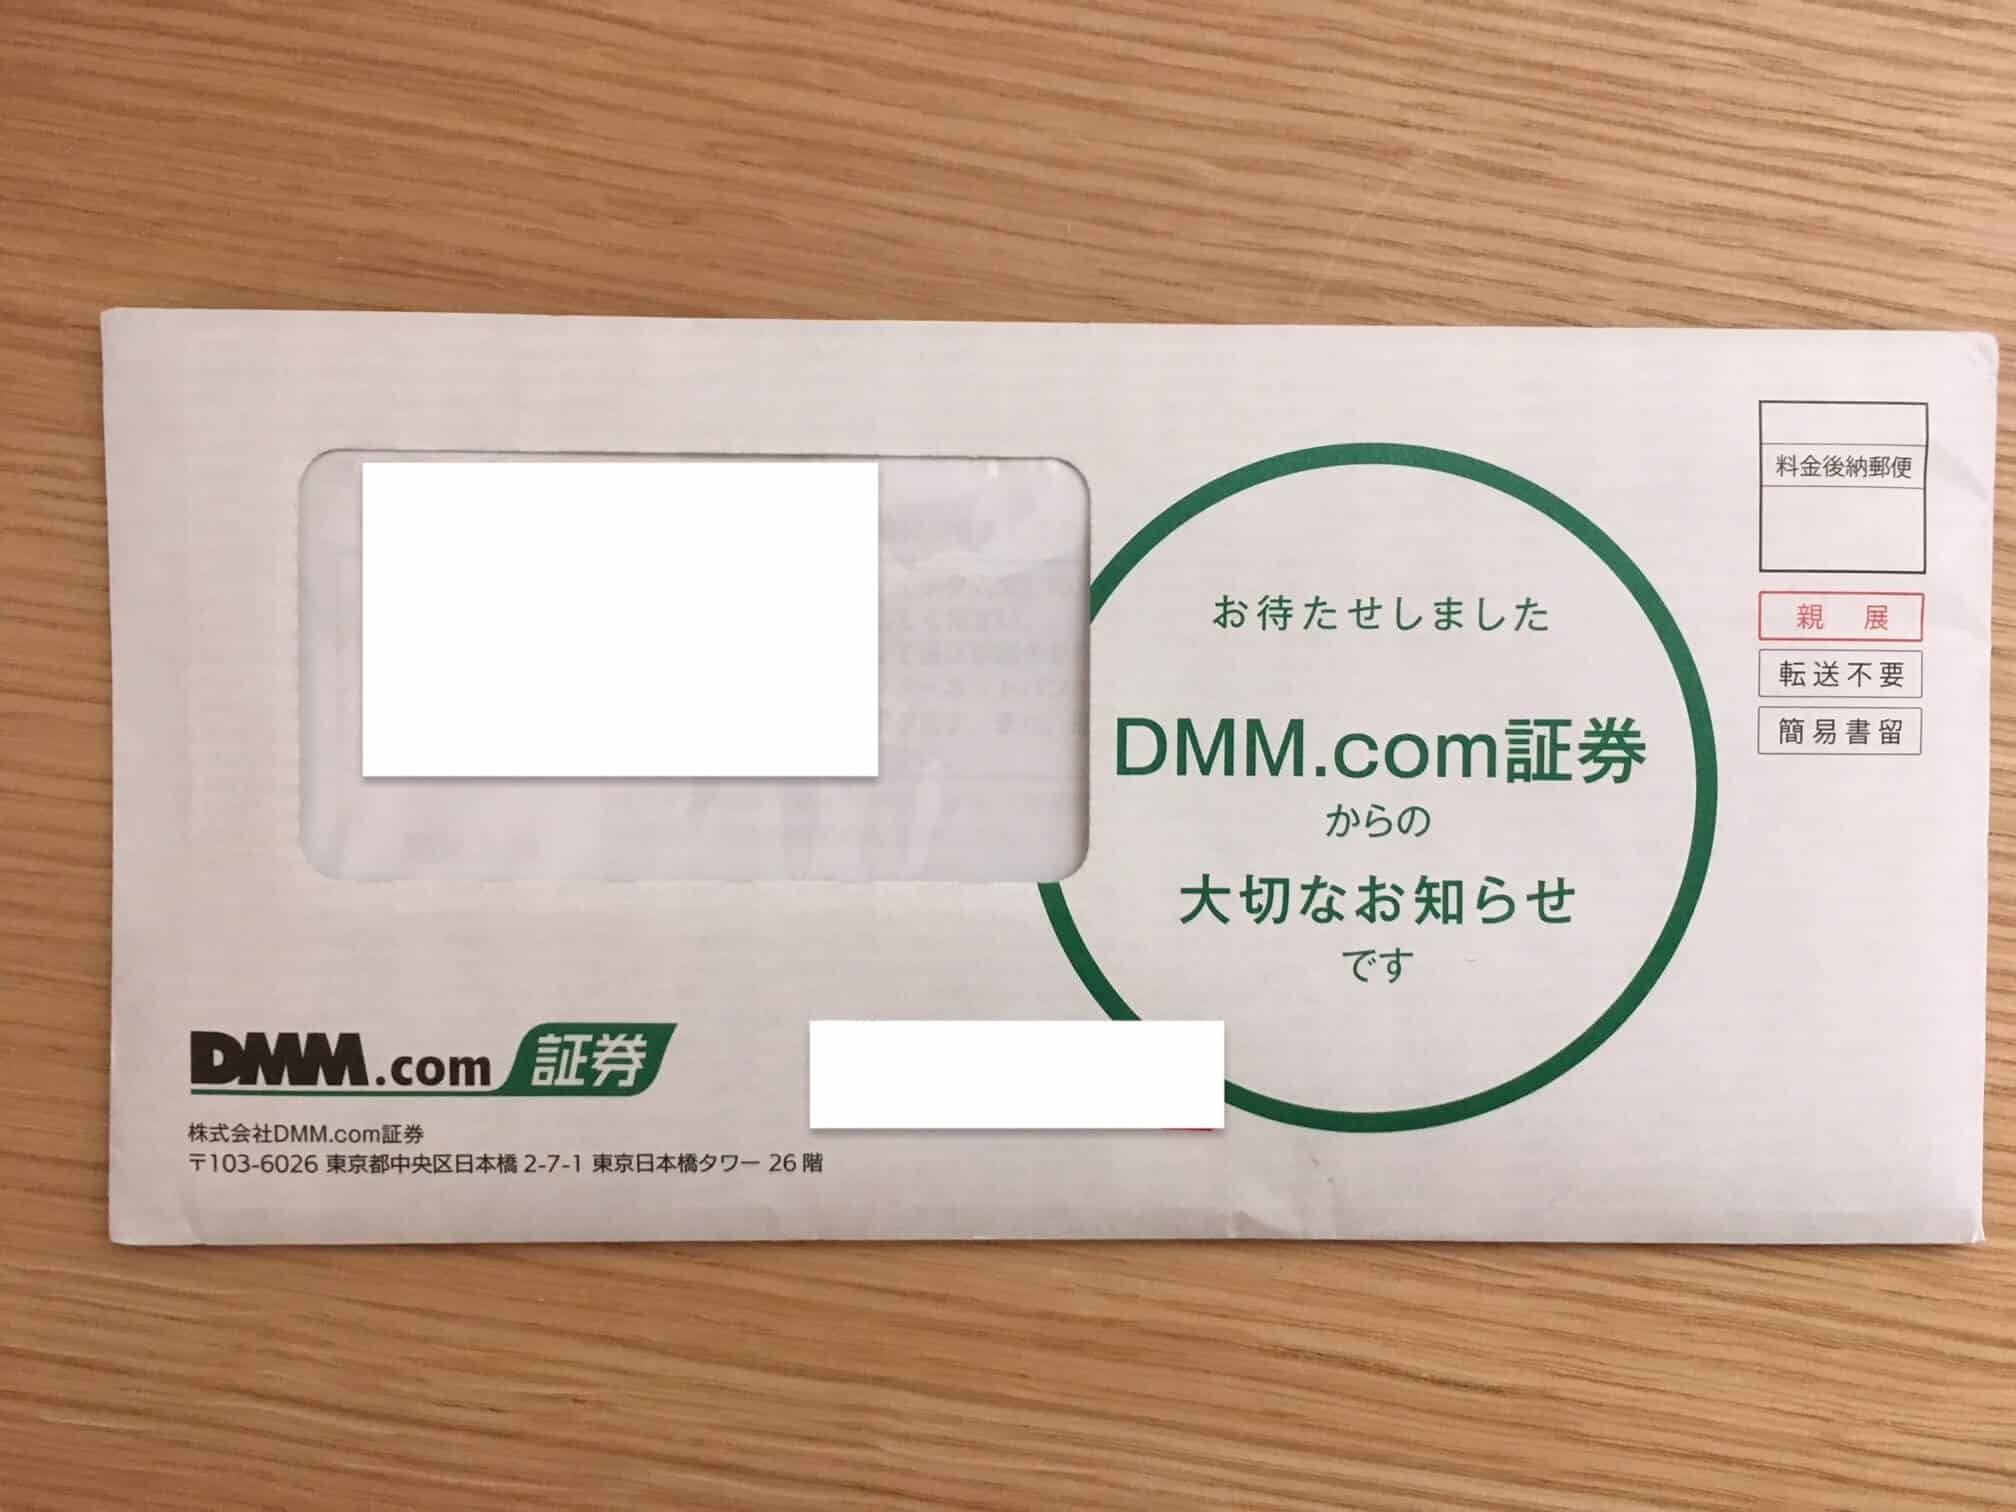 DMM.com証券・株取引の口座開設方法・手順・流れを画像付きで解説